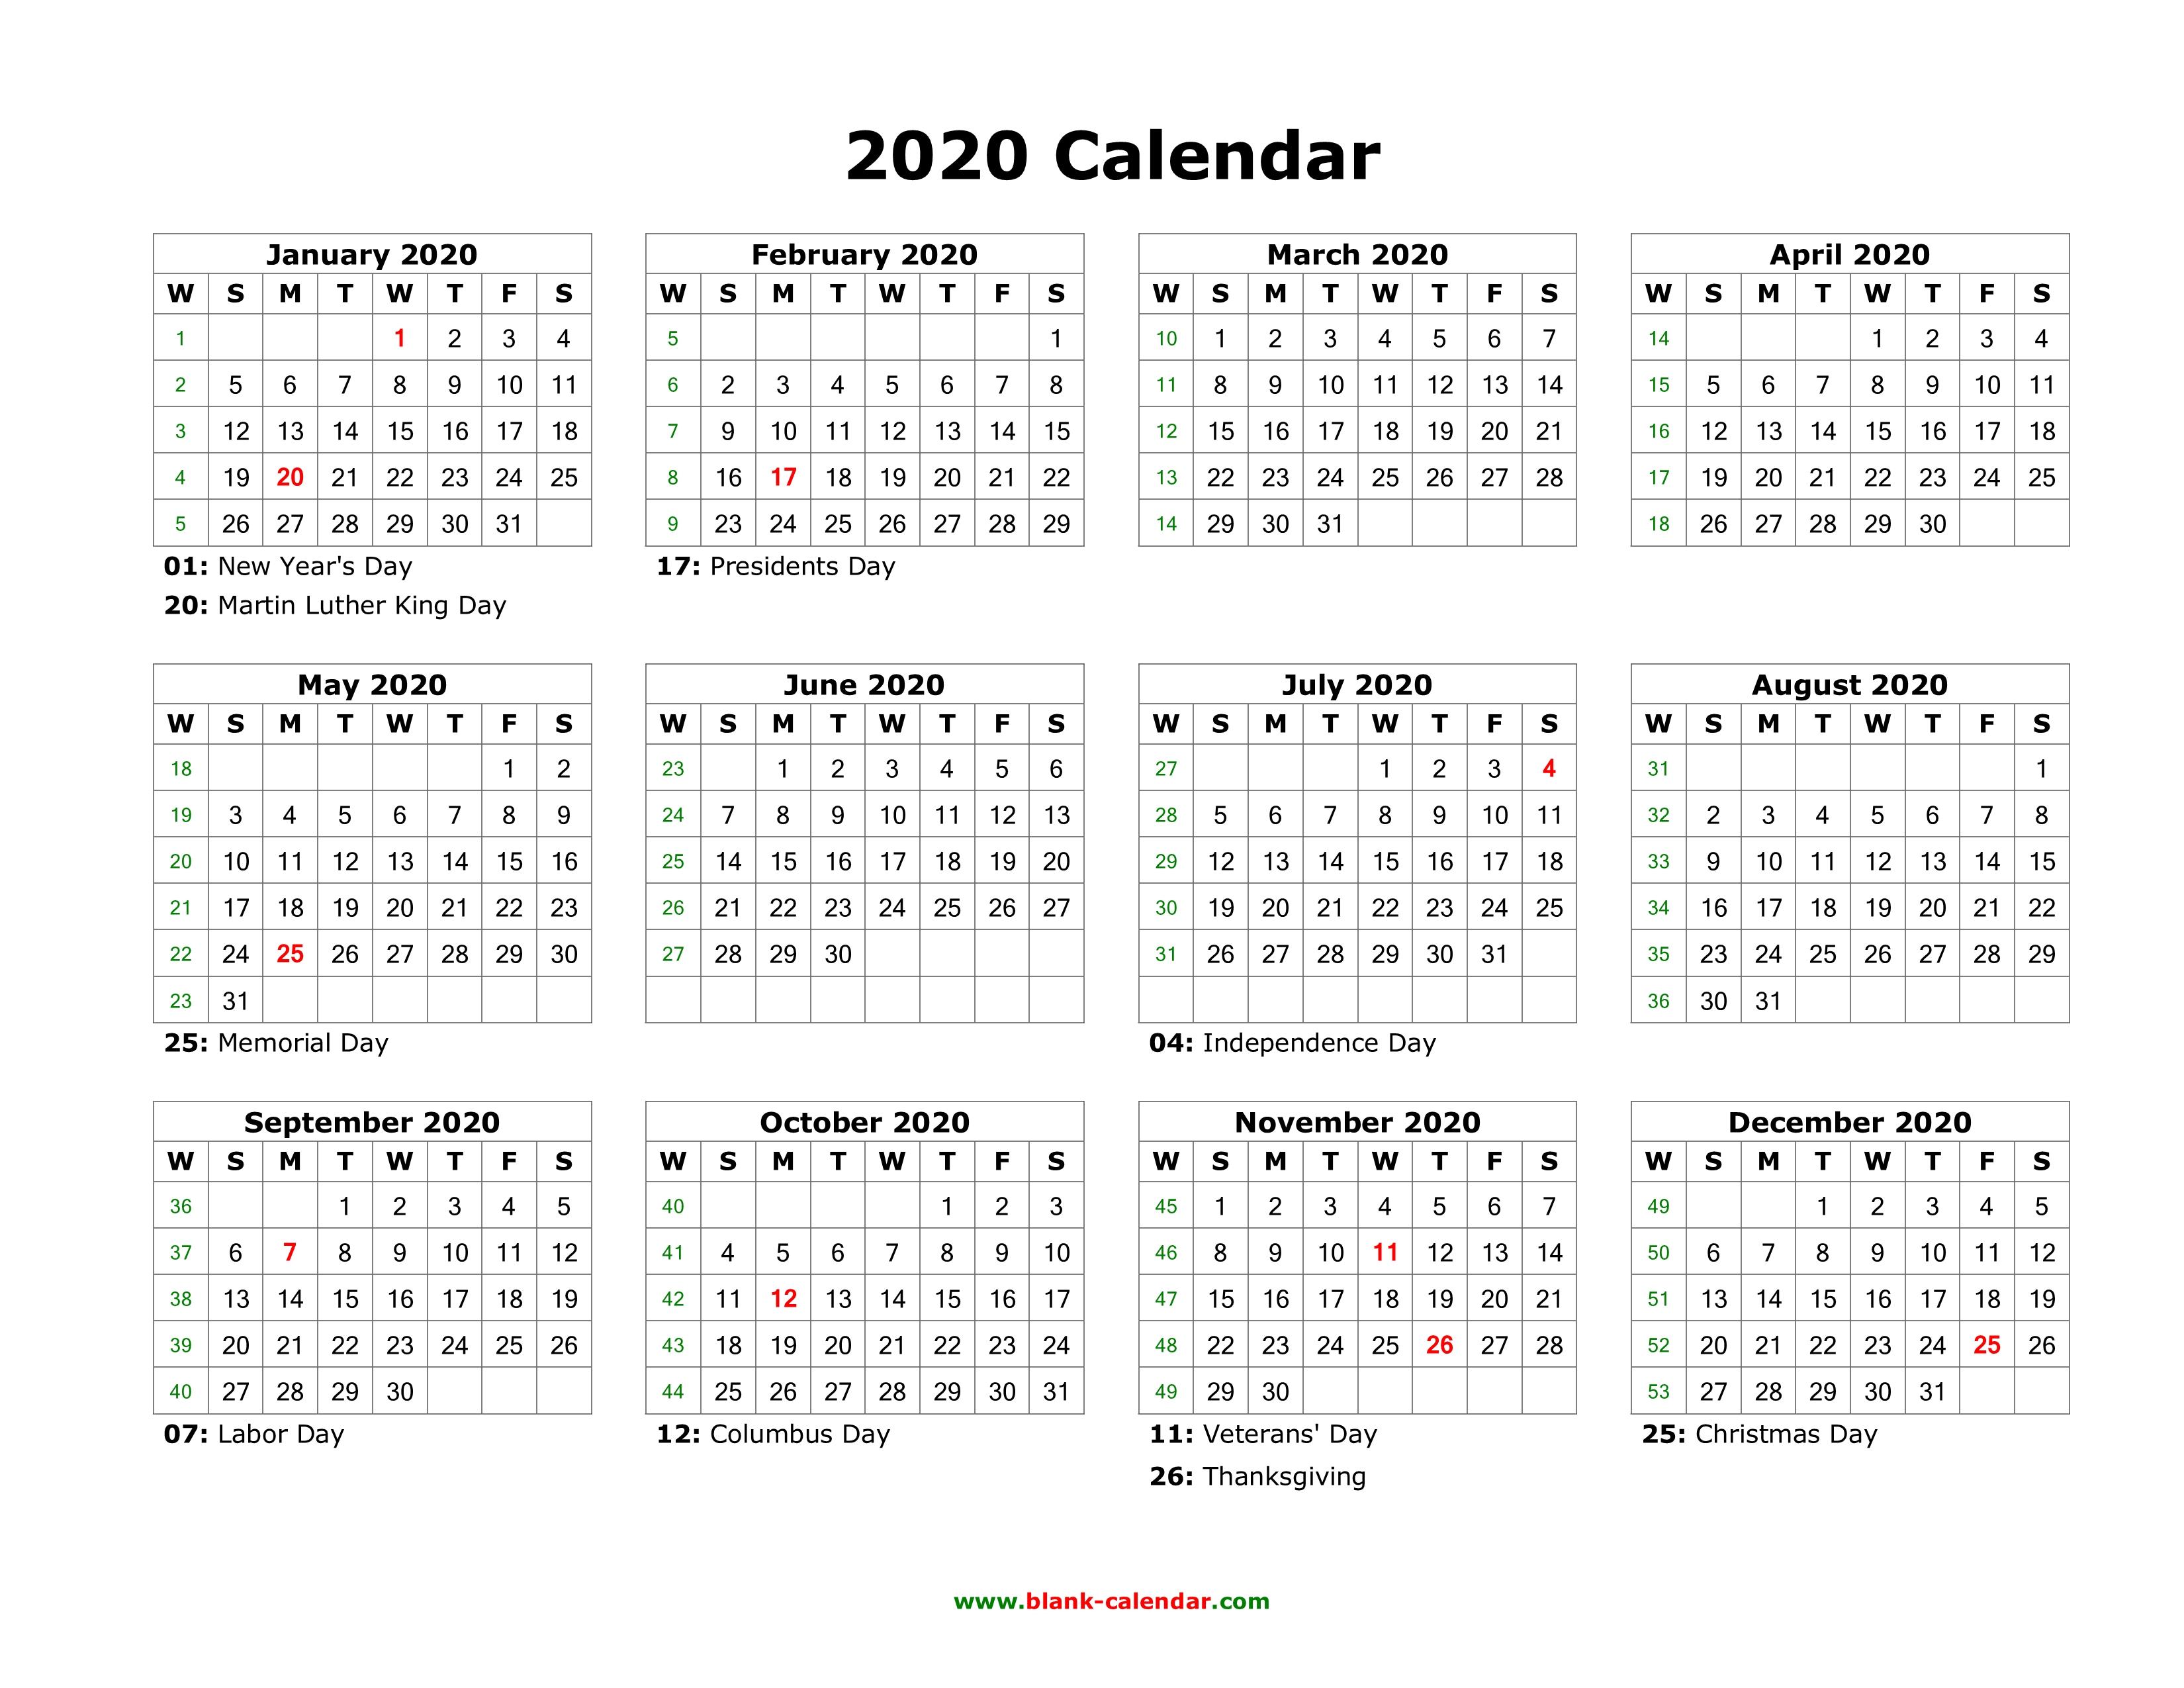 Https://idlewildfurnishing/blank-W-9-Forms-Printable-2020